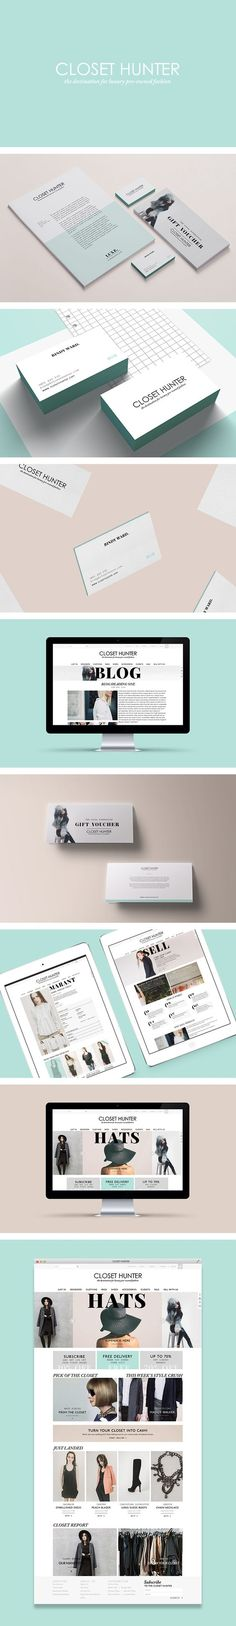 Closet Hunter brand ID by Smack Bang Designs: